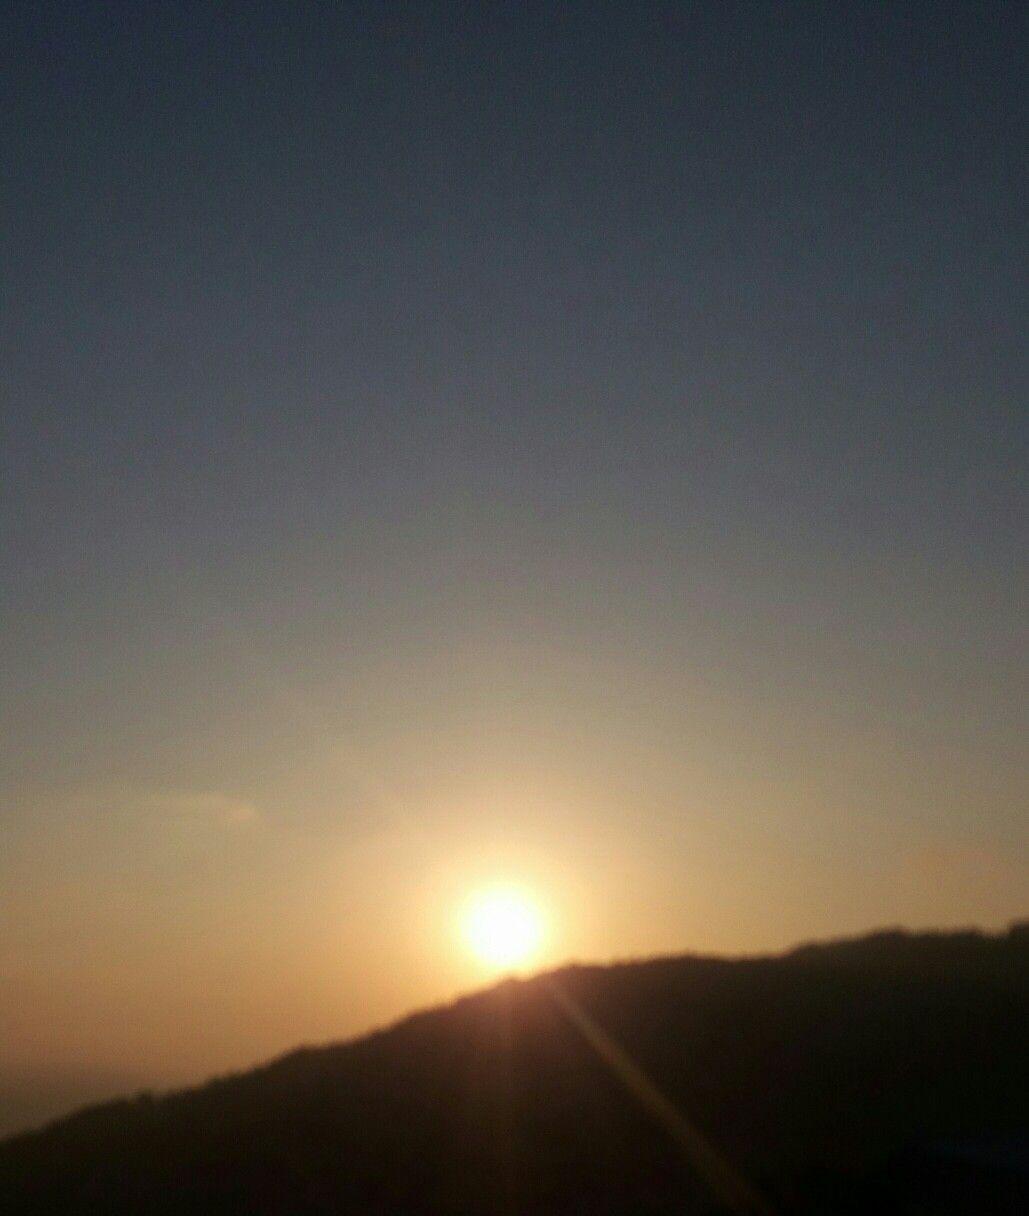 شروق الشمس جبال الجليل Sunrise Celestial Outdoor Sunset